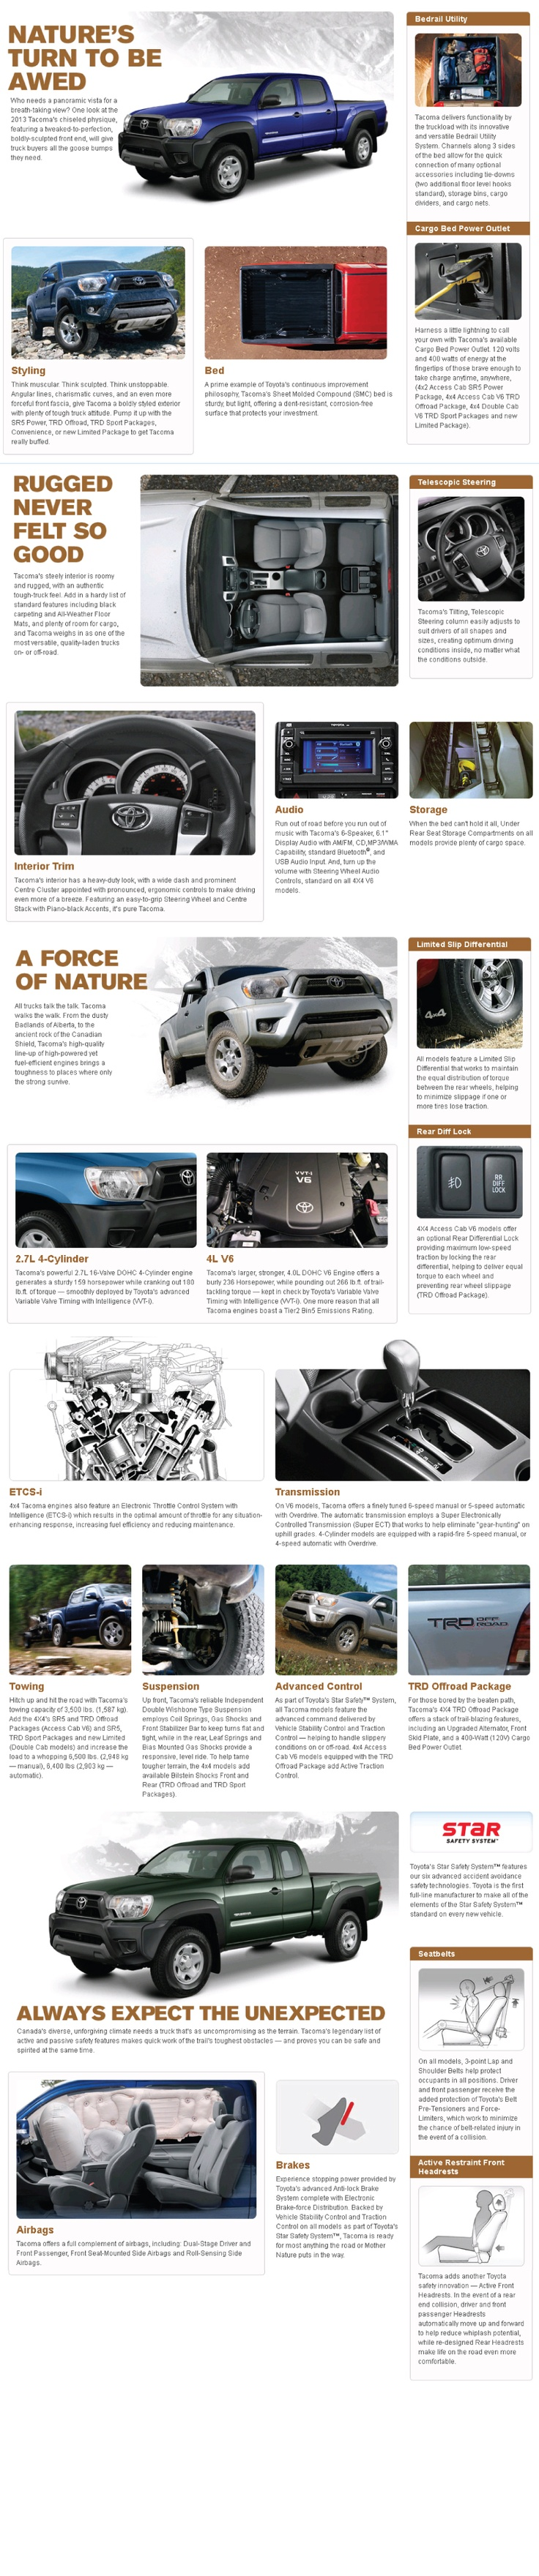 2013 Tacoma Features